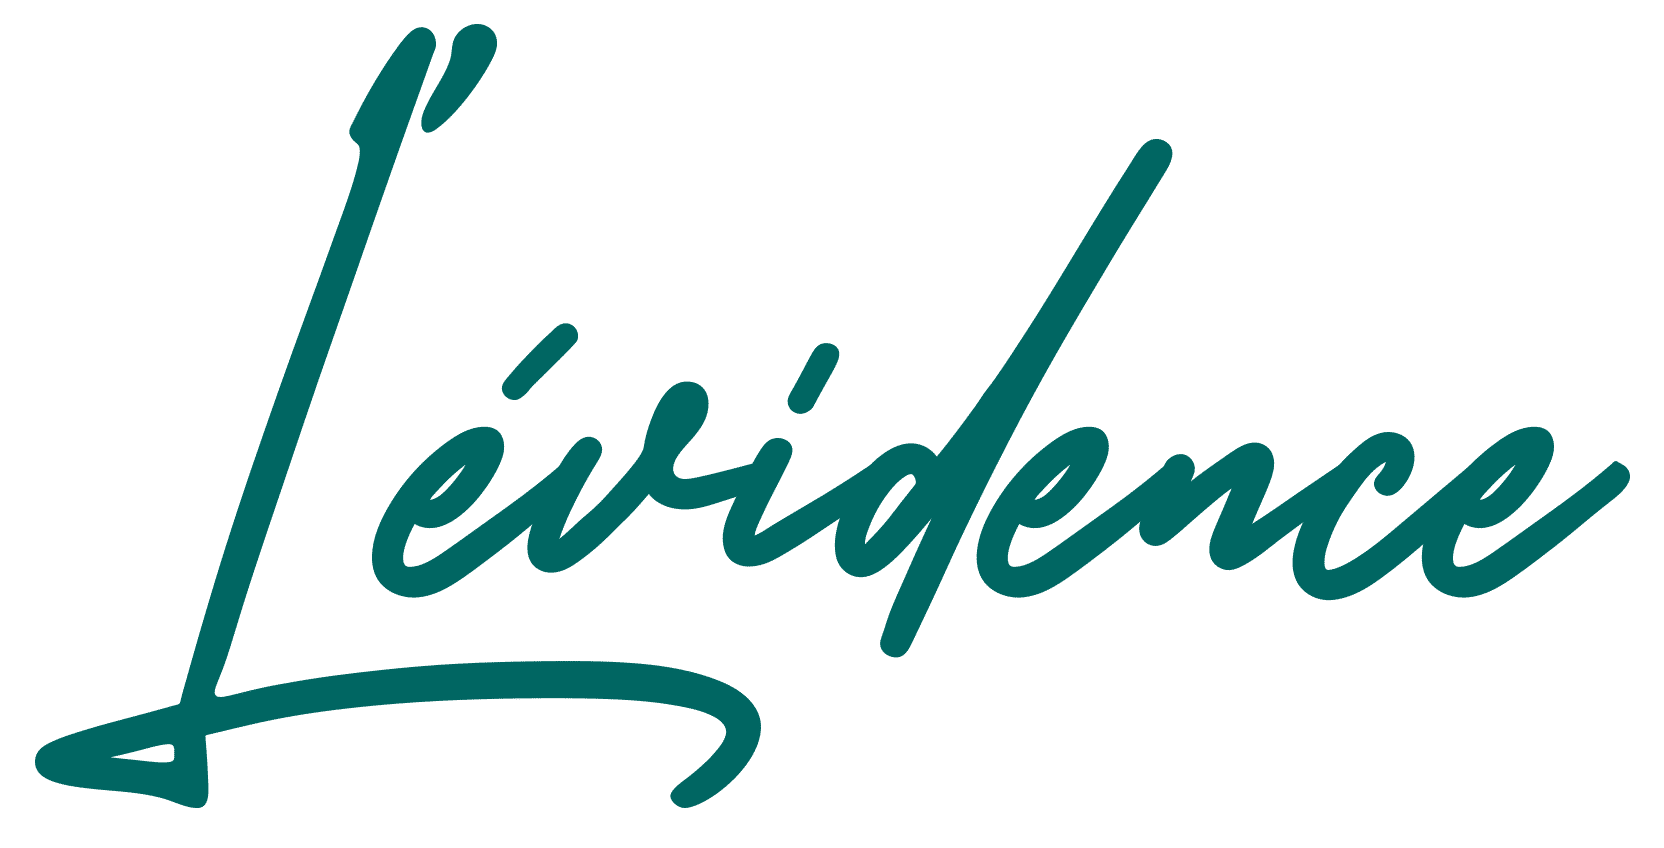 logo-texte-vert